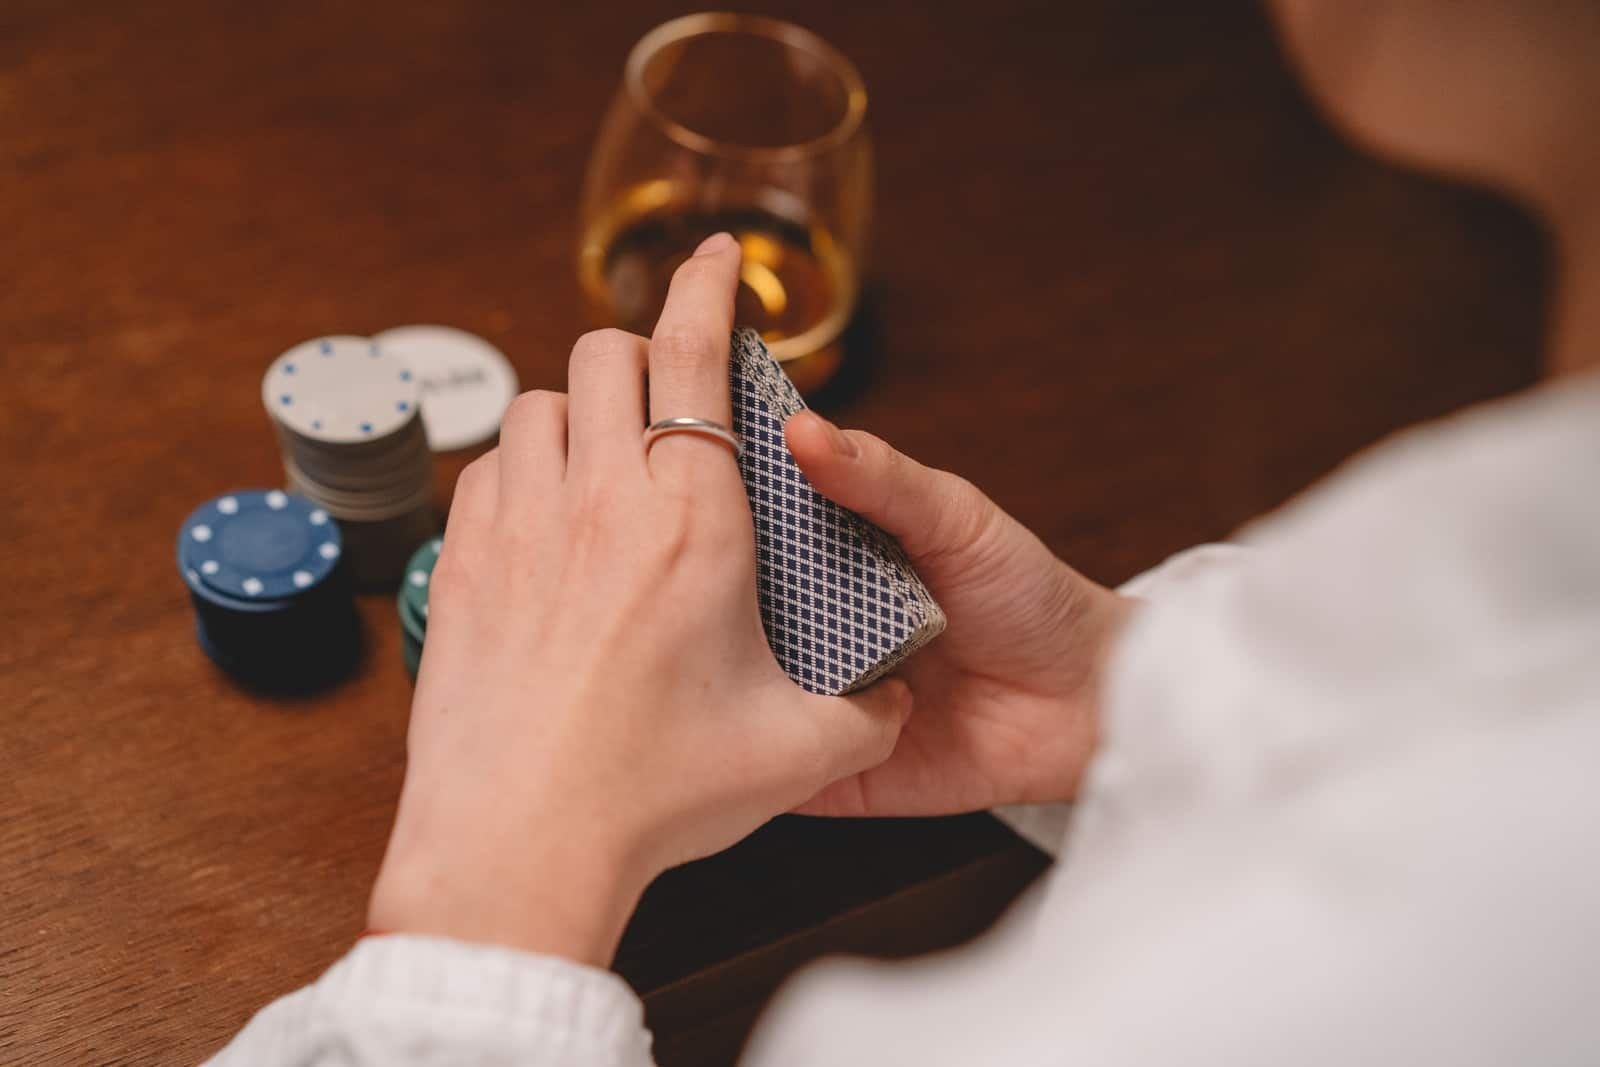 woman shuffles a deck of cards